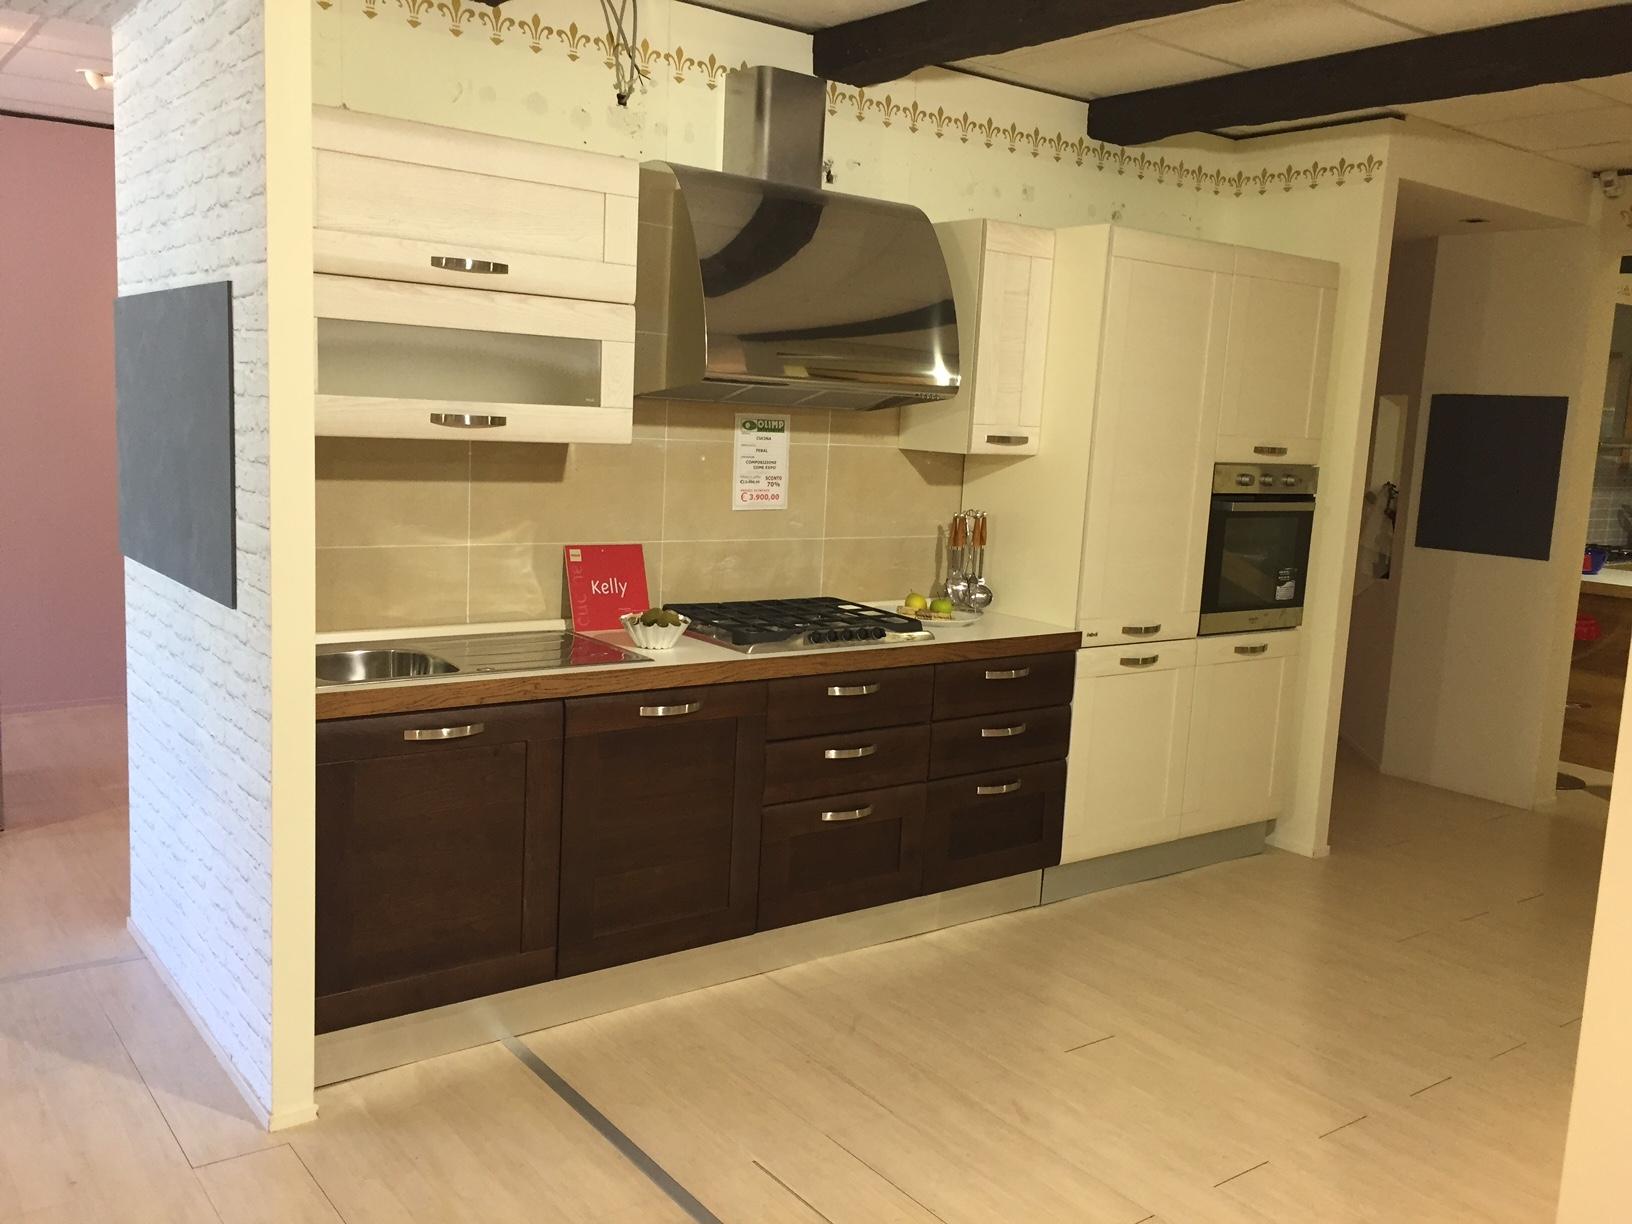 https://www.outletarredamento.it/img/cucine/febal-cucina-kelly-moderne-legno-magnolia_O2.jpg